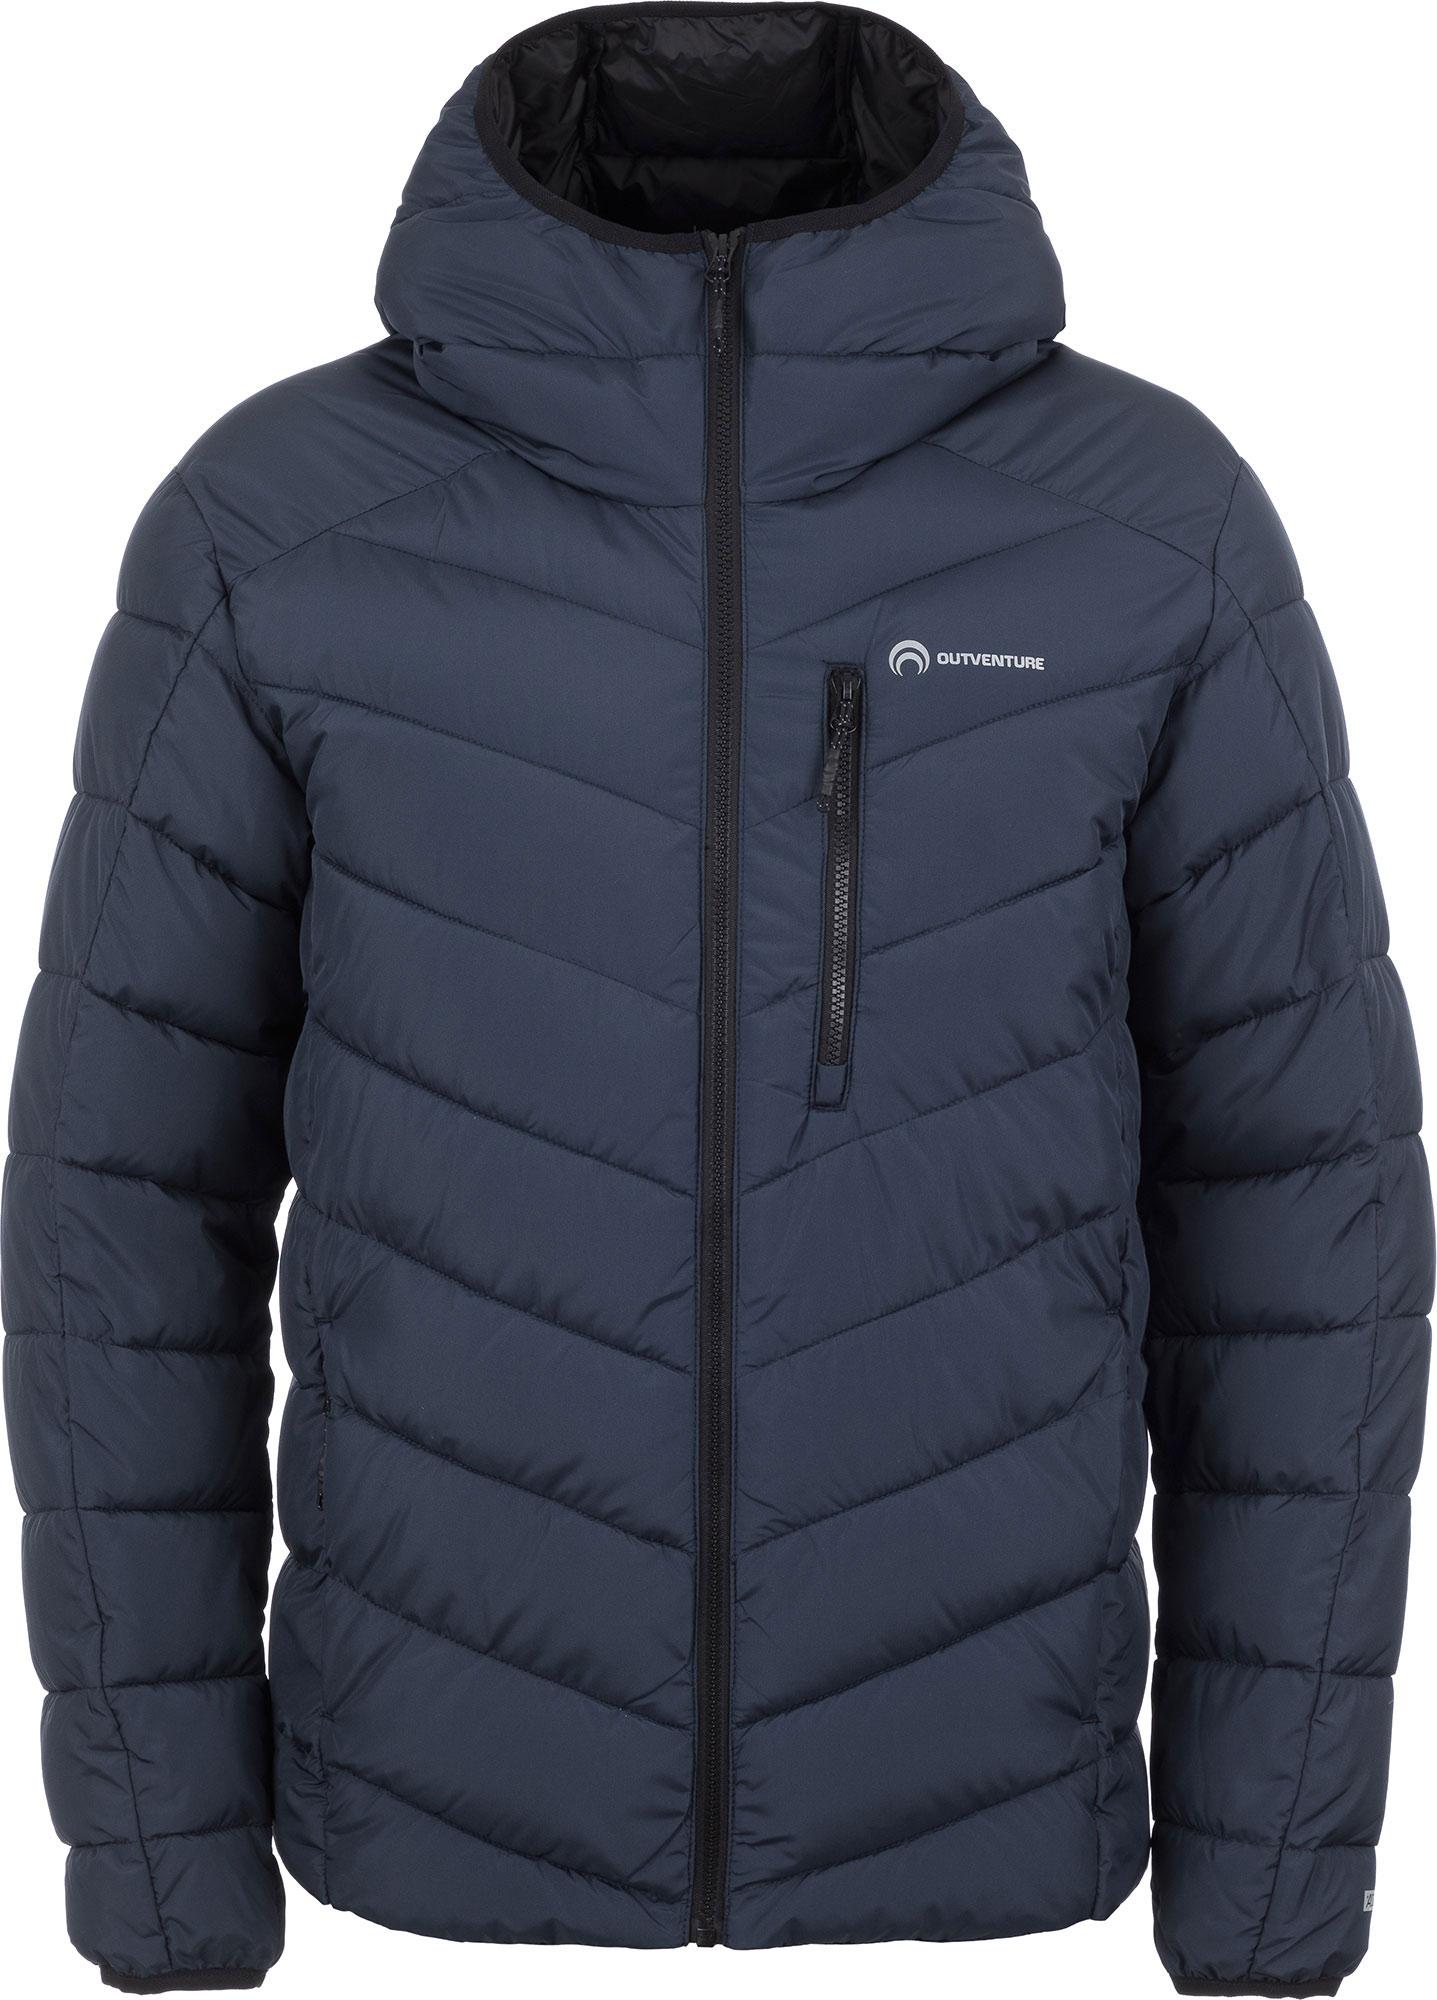 Outventure Куртка утепленная мужская Outventure, размер 54 куртка мужская geox цвет темно синий m8220kt2447f4386 размер 54